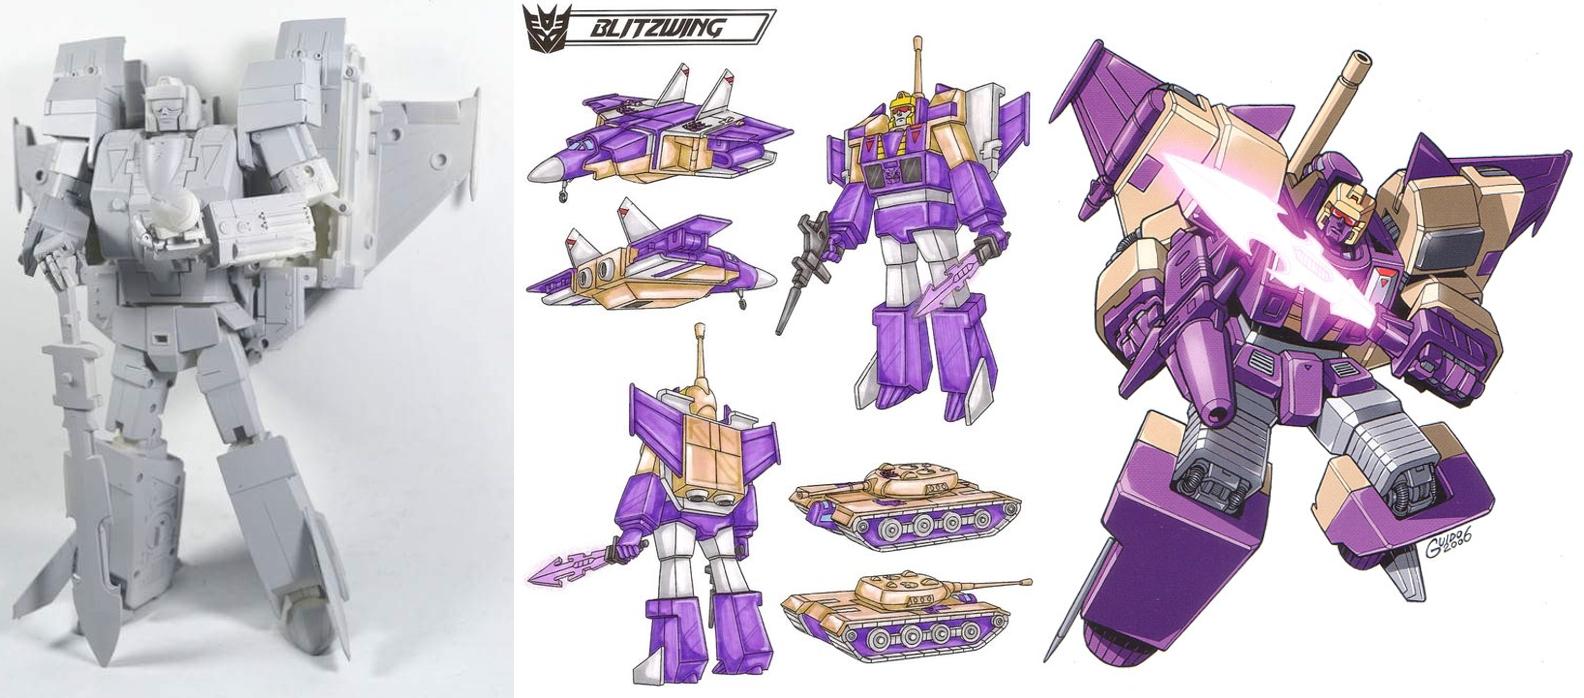 [KFC Toys] Produit Tiers - Jouet Phase 7-A Ditka - aka Blitzwing/Le Blitz RQKrdpTh